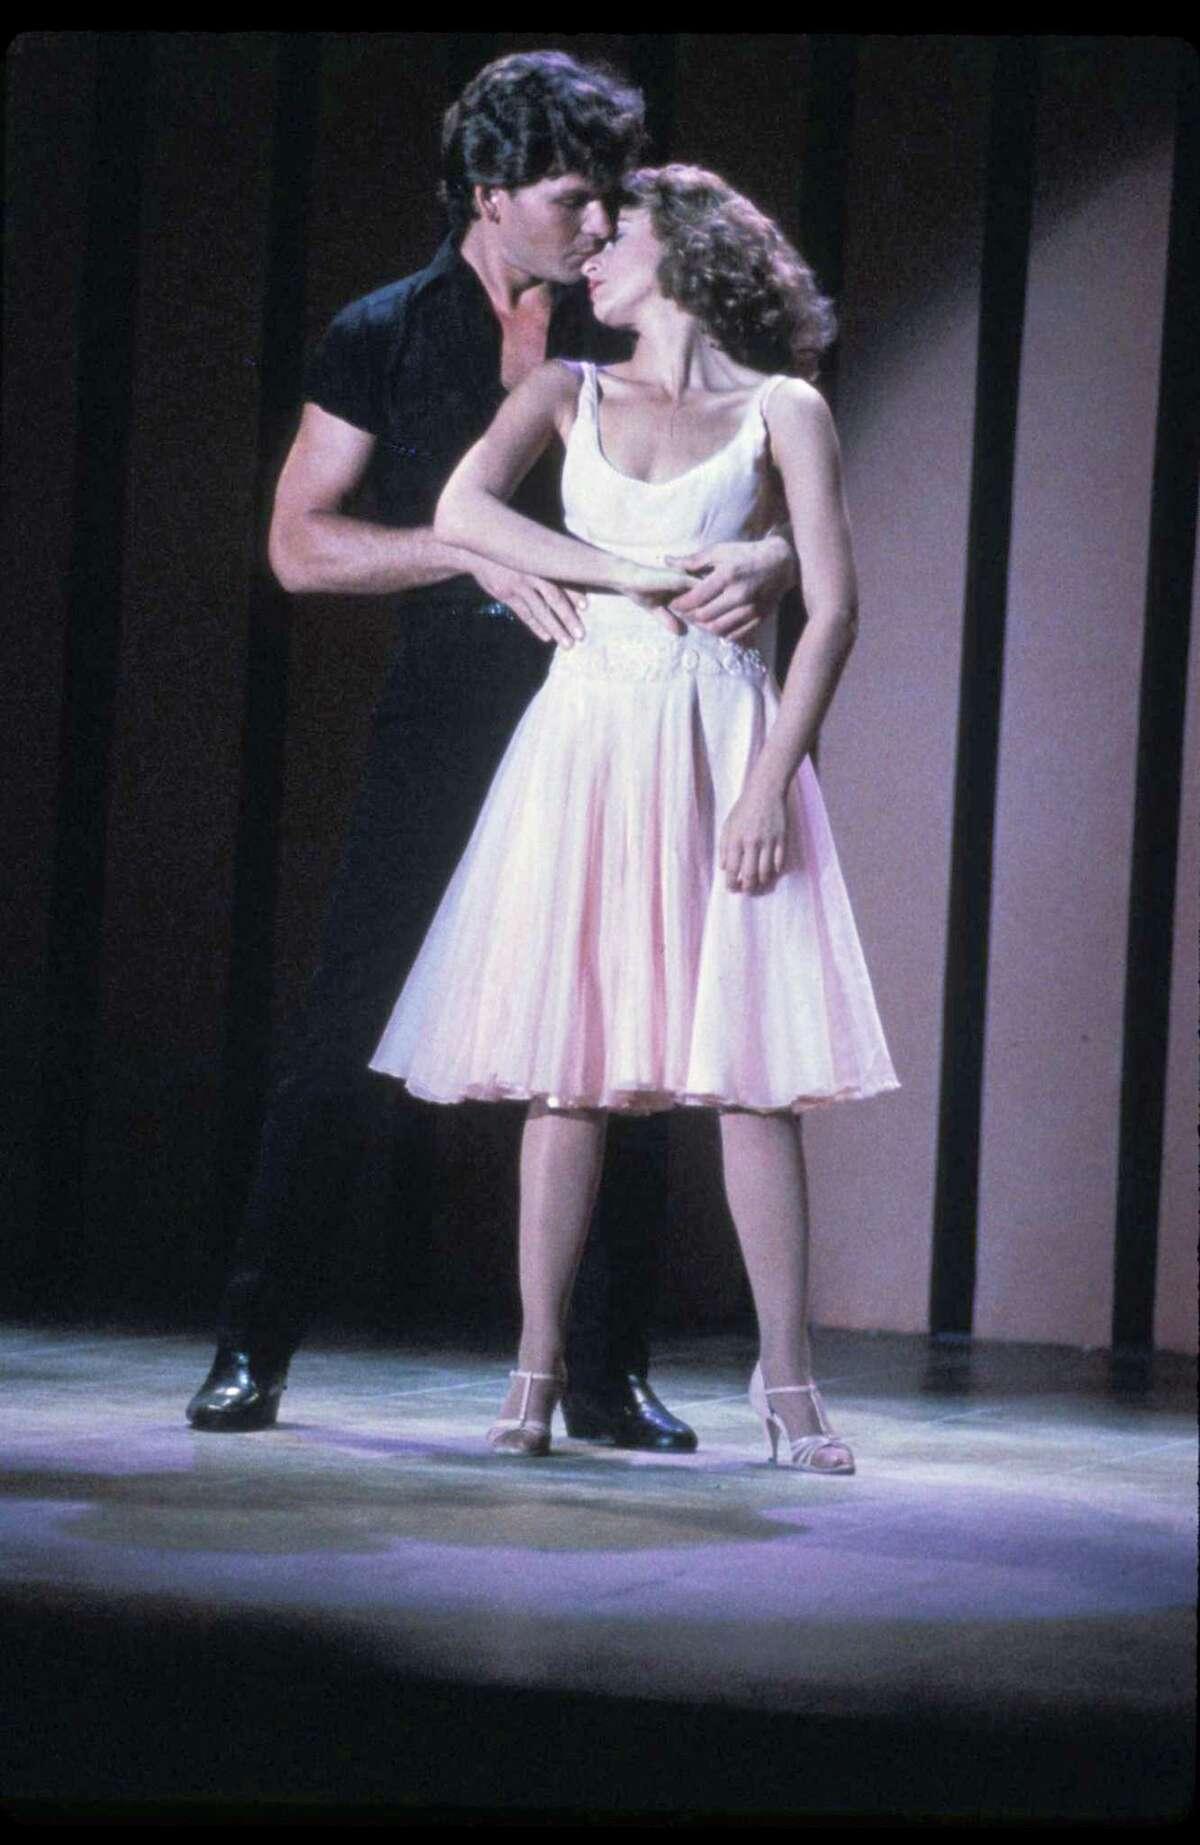 Jennifer Grey (Baby Houseman) and Patrick Swayze (Johnny Castle) in